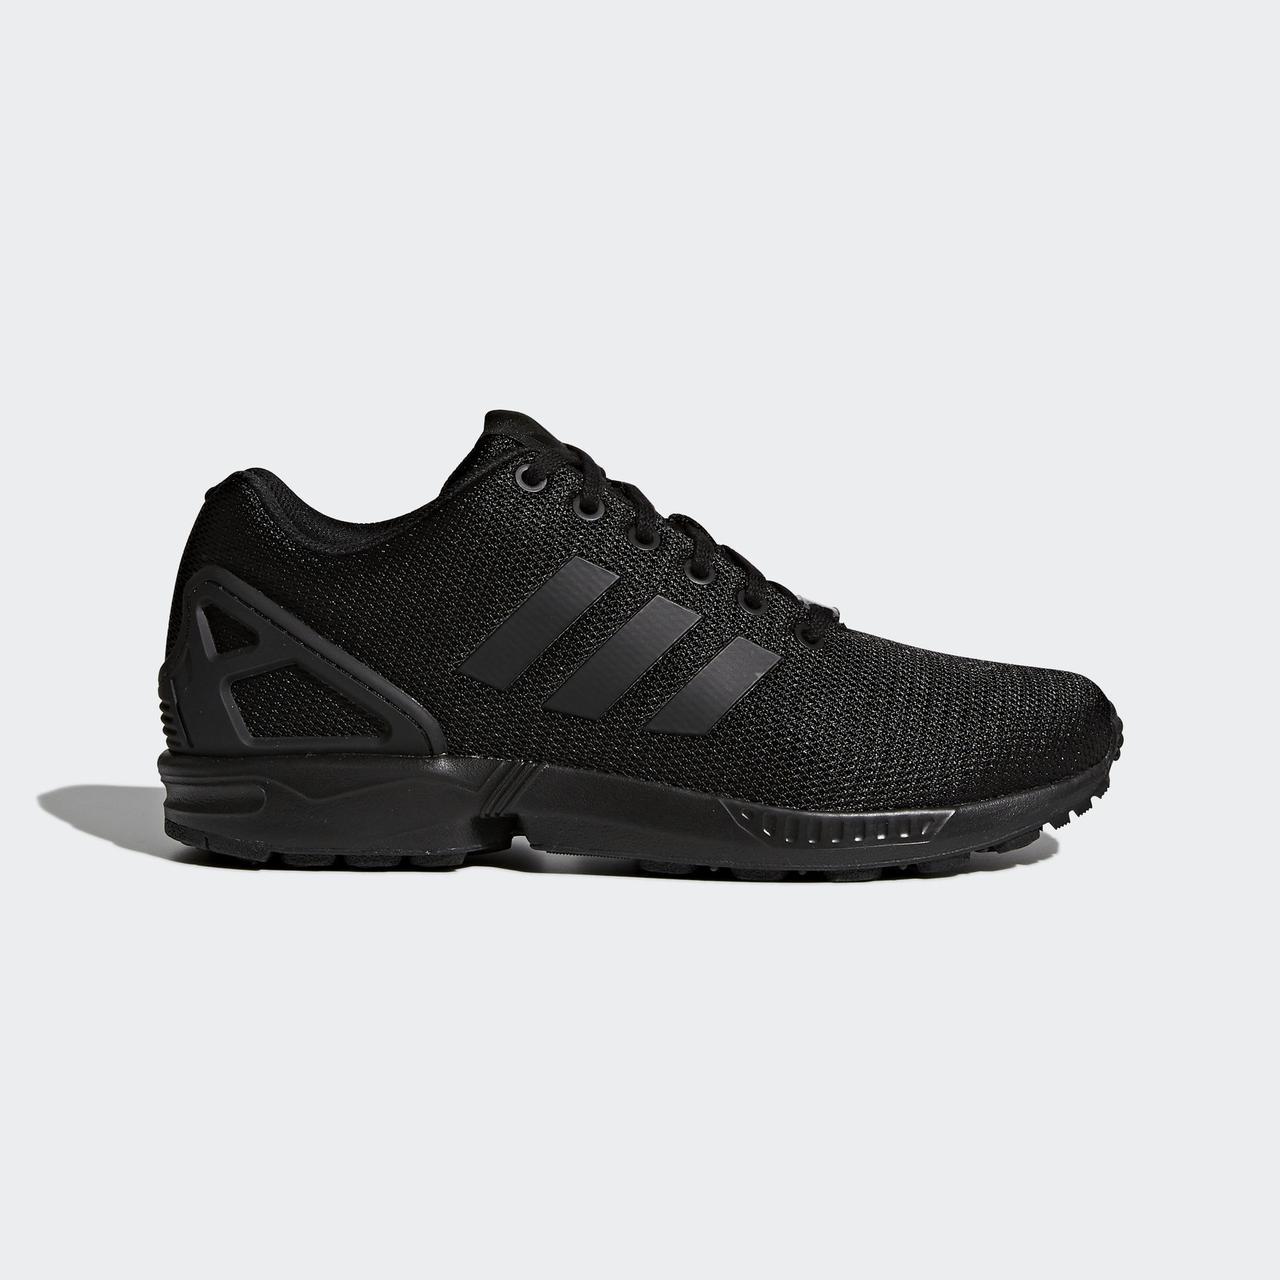 6f1635d0 Купить Мужские кроссовки Adidas Originals ZX Flux (Артикул: S32279 ...